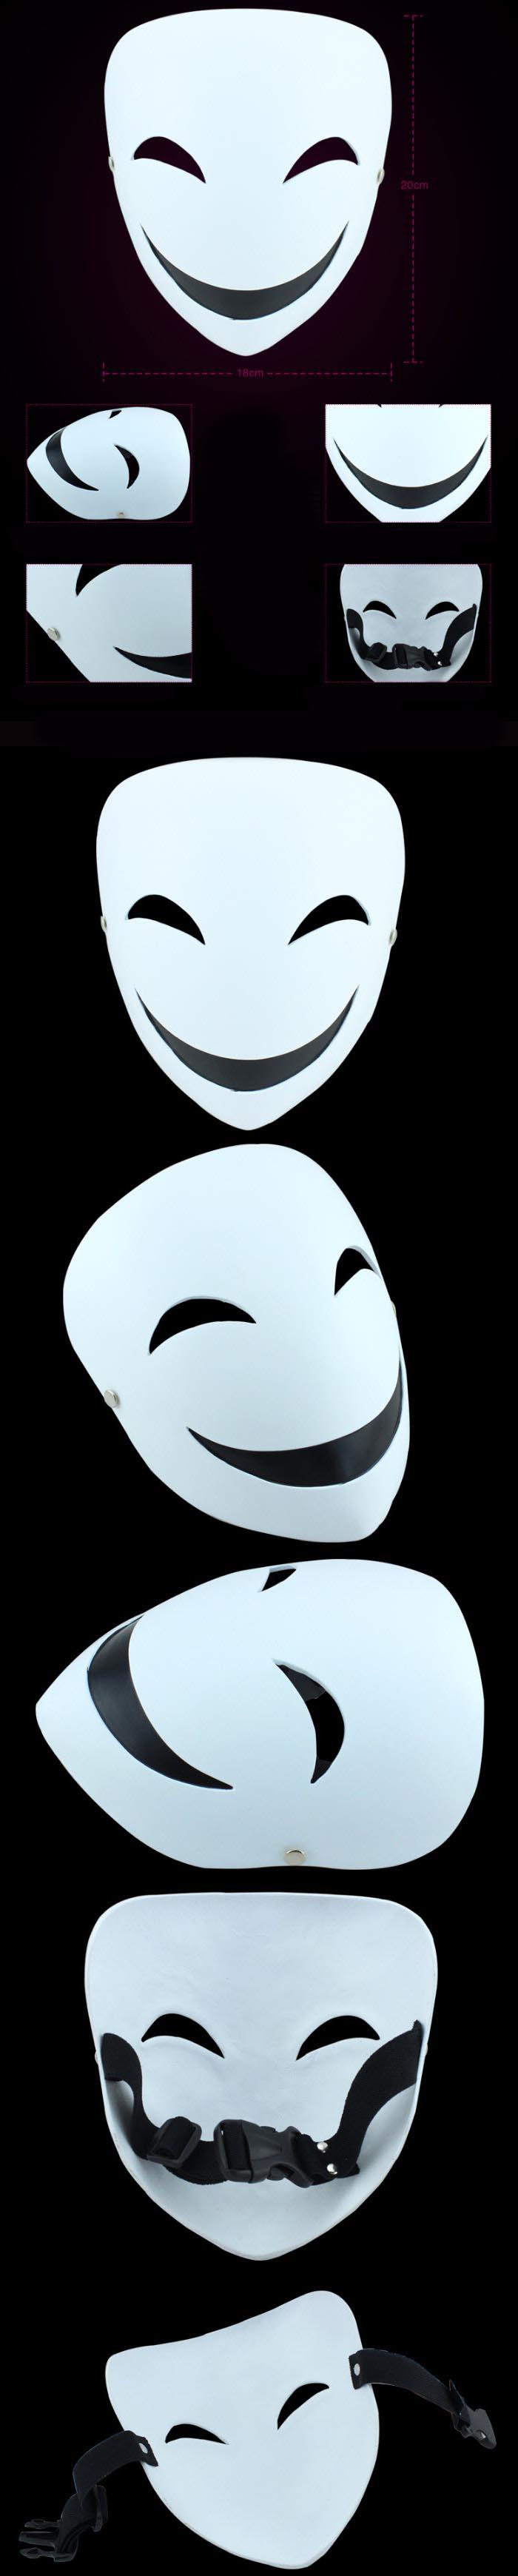 Kagetane Hiruko 蛭子 影胤(ひるこ かげたね) mask